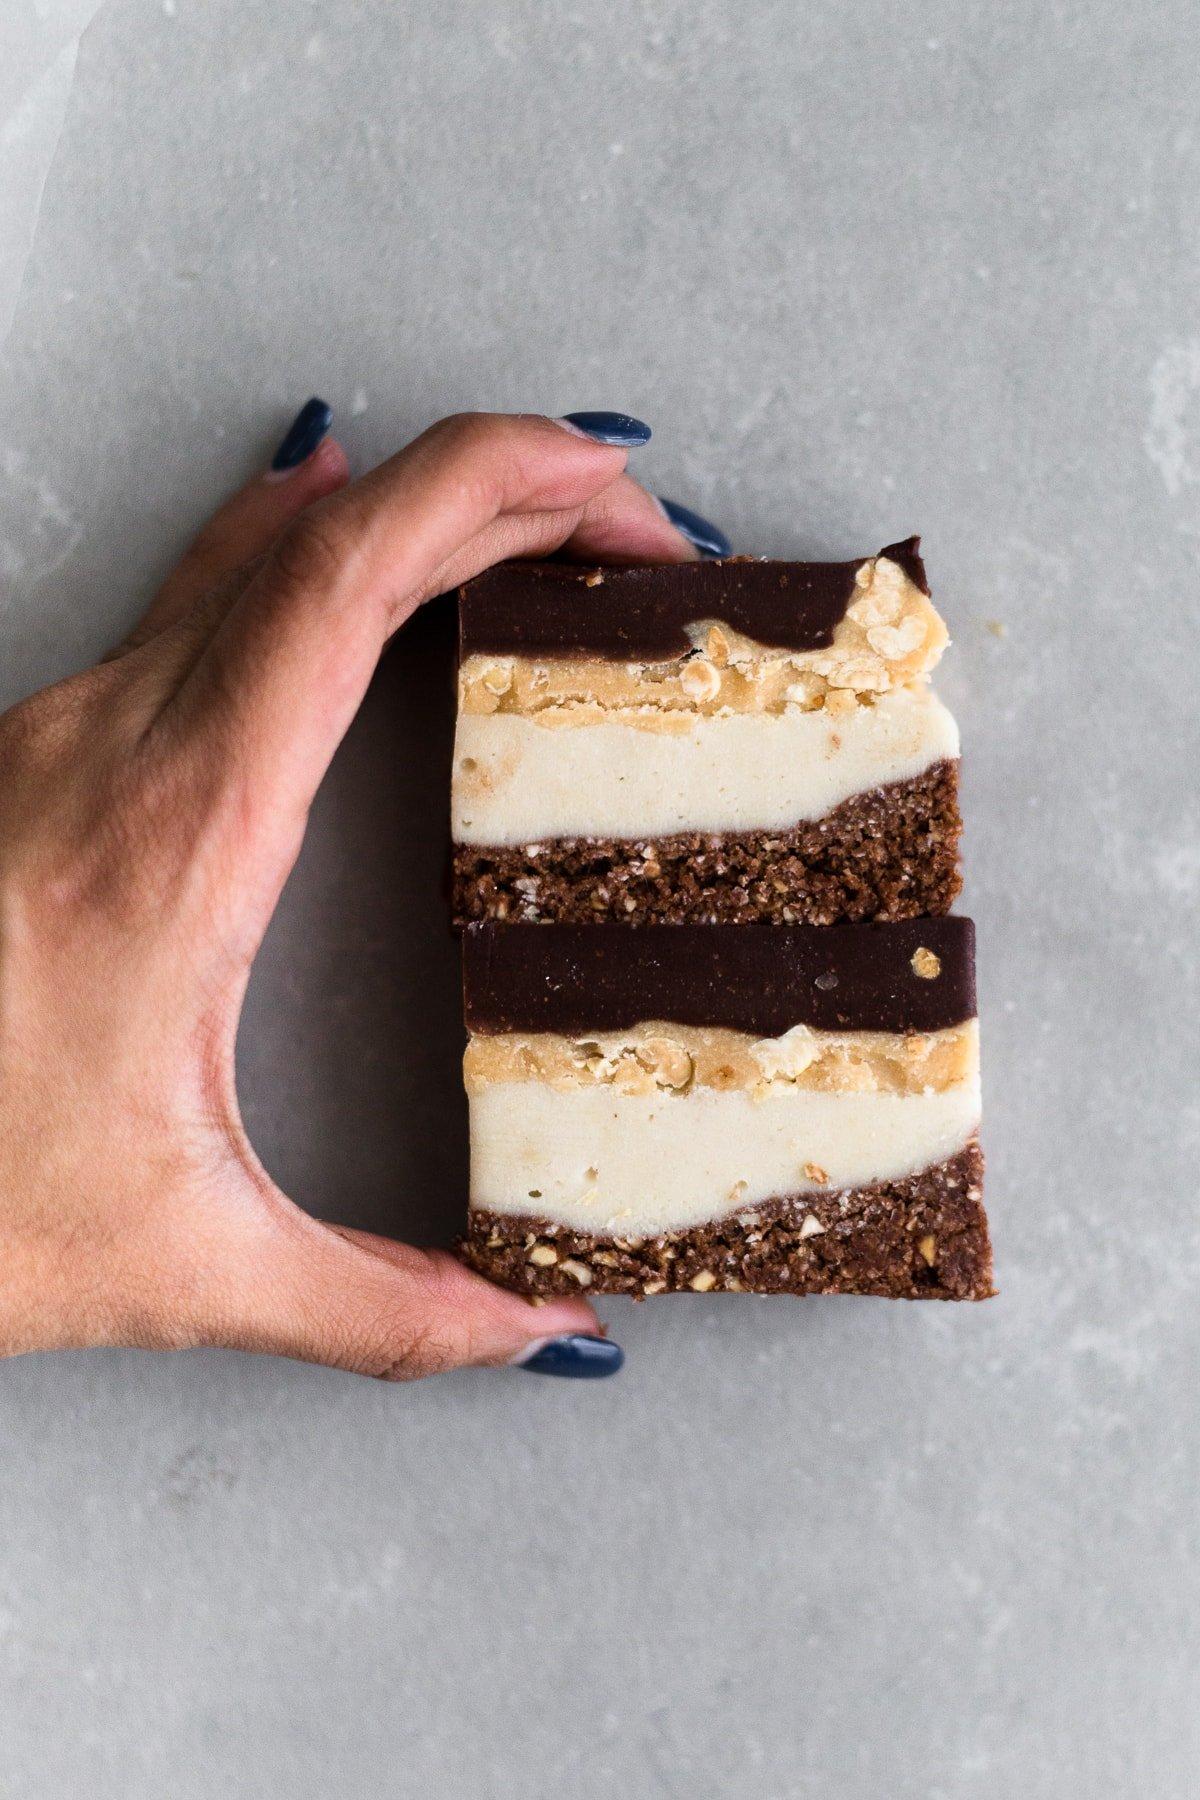 Vegan Snickers Ice Cream Cake. Vanilla Ice Cream base, Caramel Peanut Layer and a lush Chocolate Ganache topping. Dairy Free/Gluten Free/Refined Sugar Free. #vegan #snickers #icecream #chocolate #peanut #peanutbutter #caramel #raw #healthy #sugarfree #simple #nobake